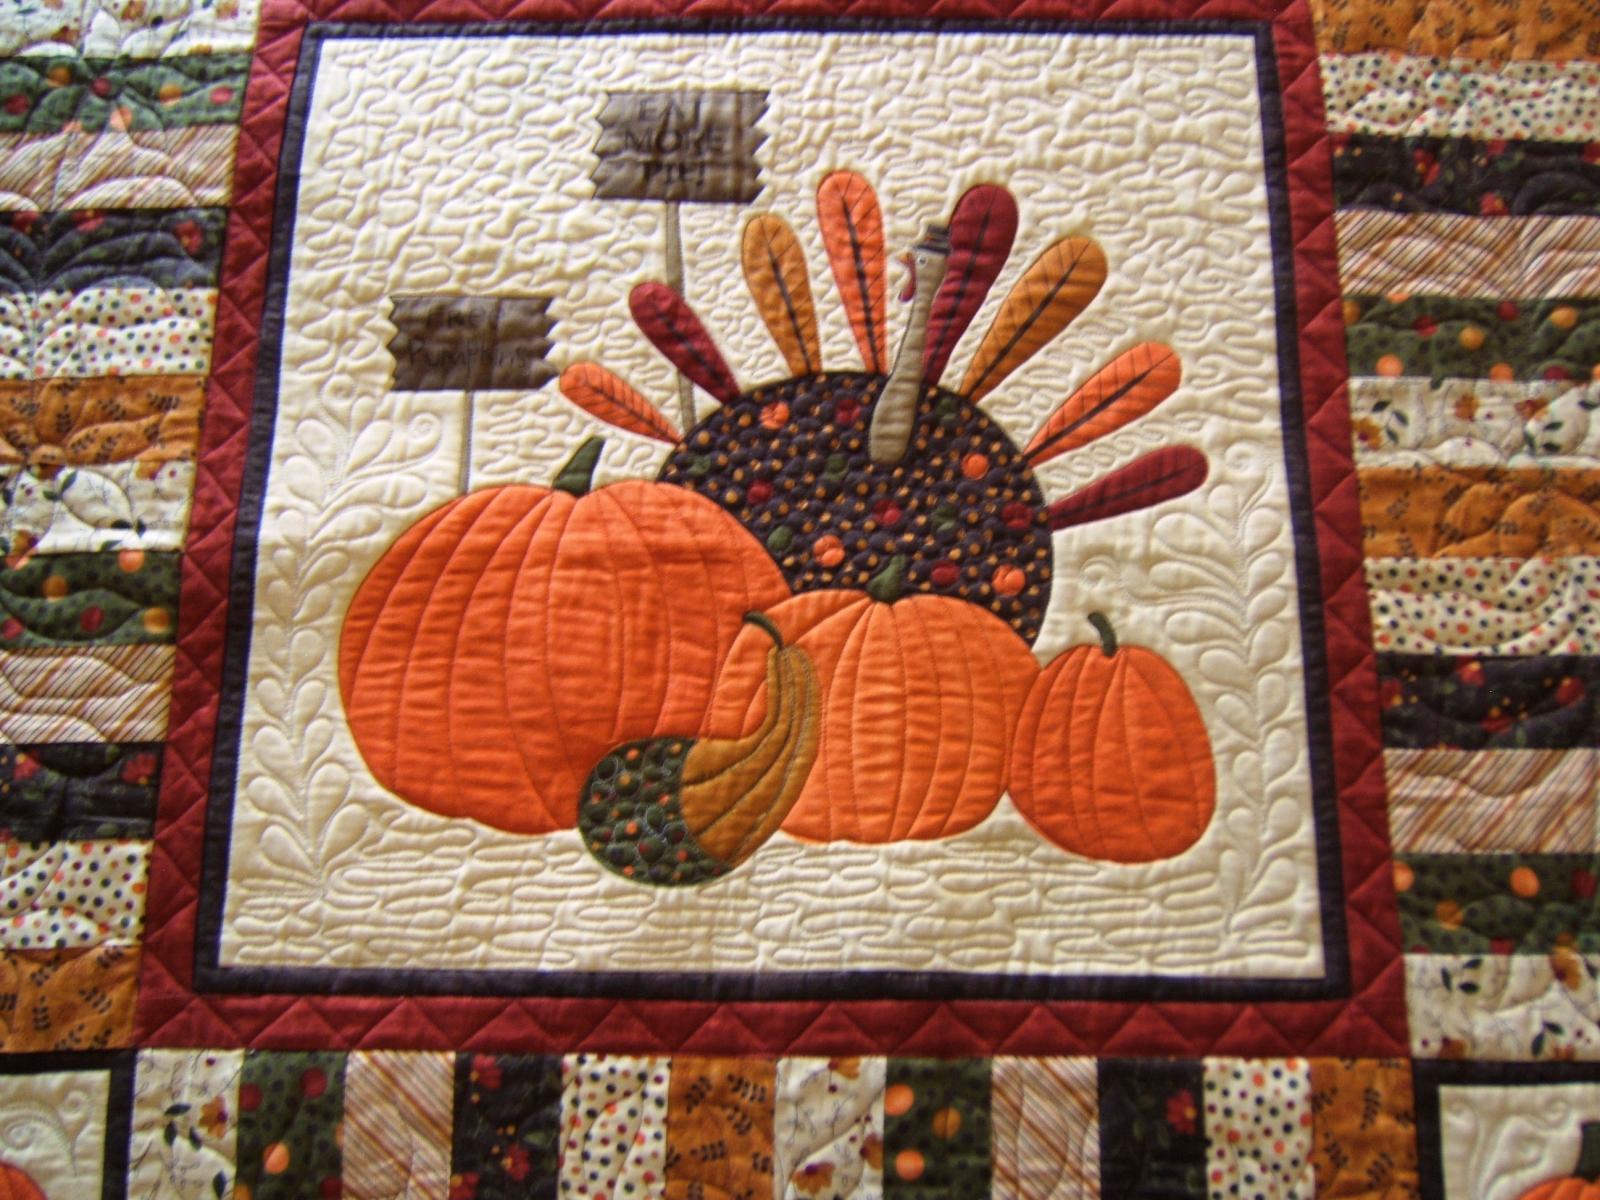 cheryls+thanksgiving+quilt+002.jpg